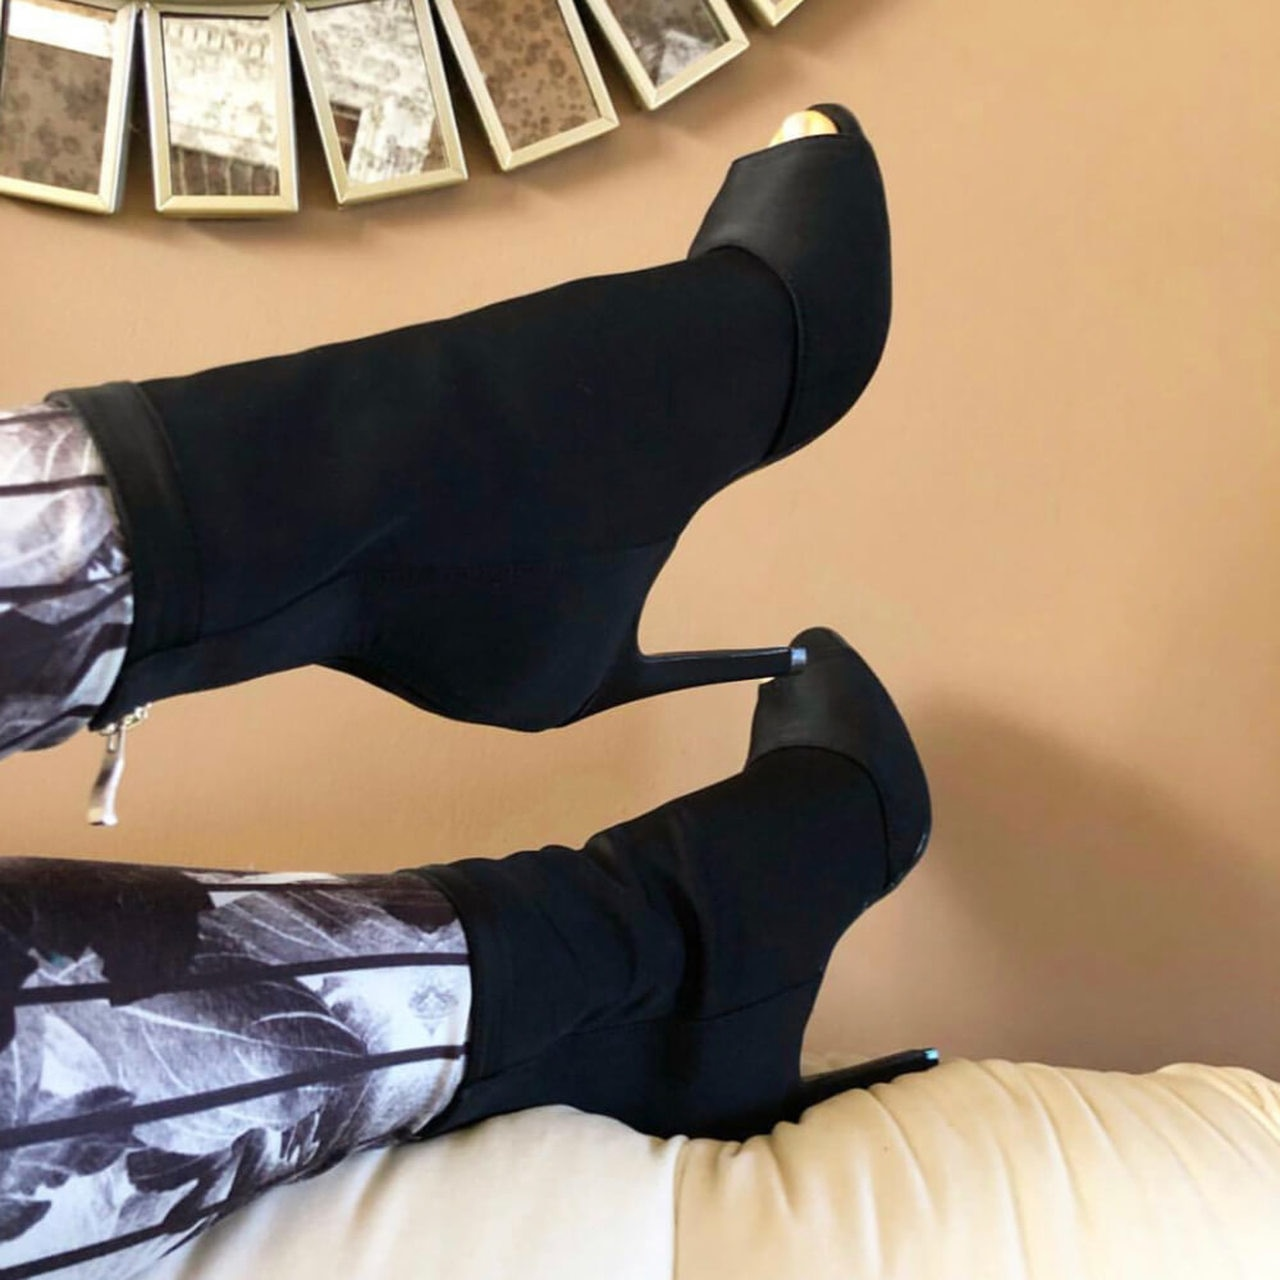 Discounts Sale Jazz Salsa Ballroom Latin Dance Shoes High Heel For Dancing Women Training Ladies Boot Black Flock Summer Boots